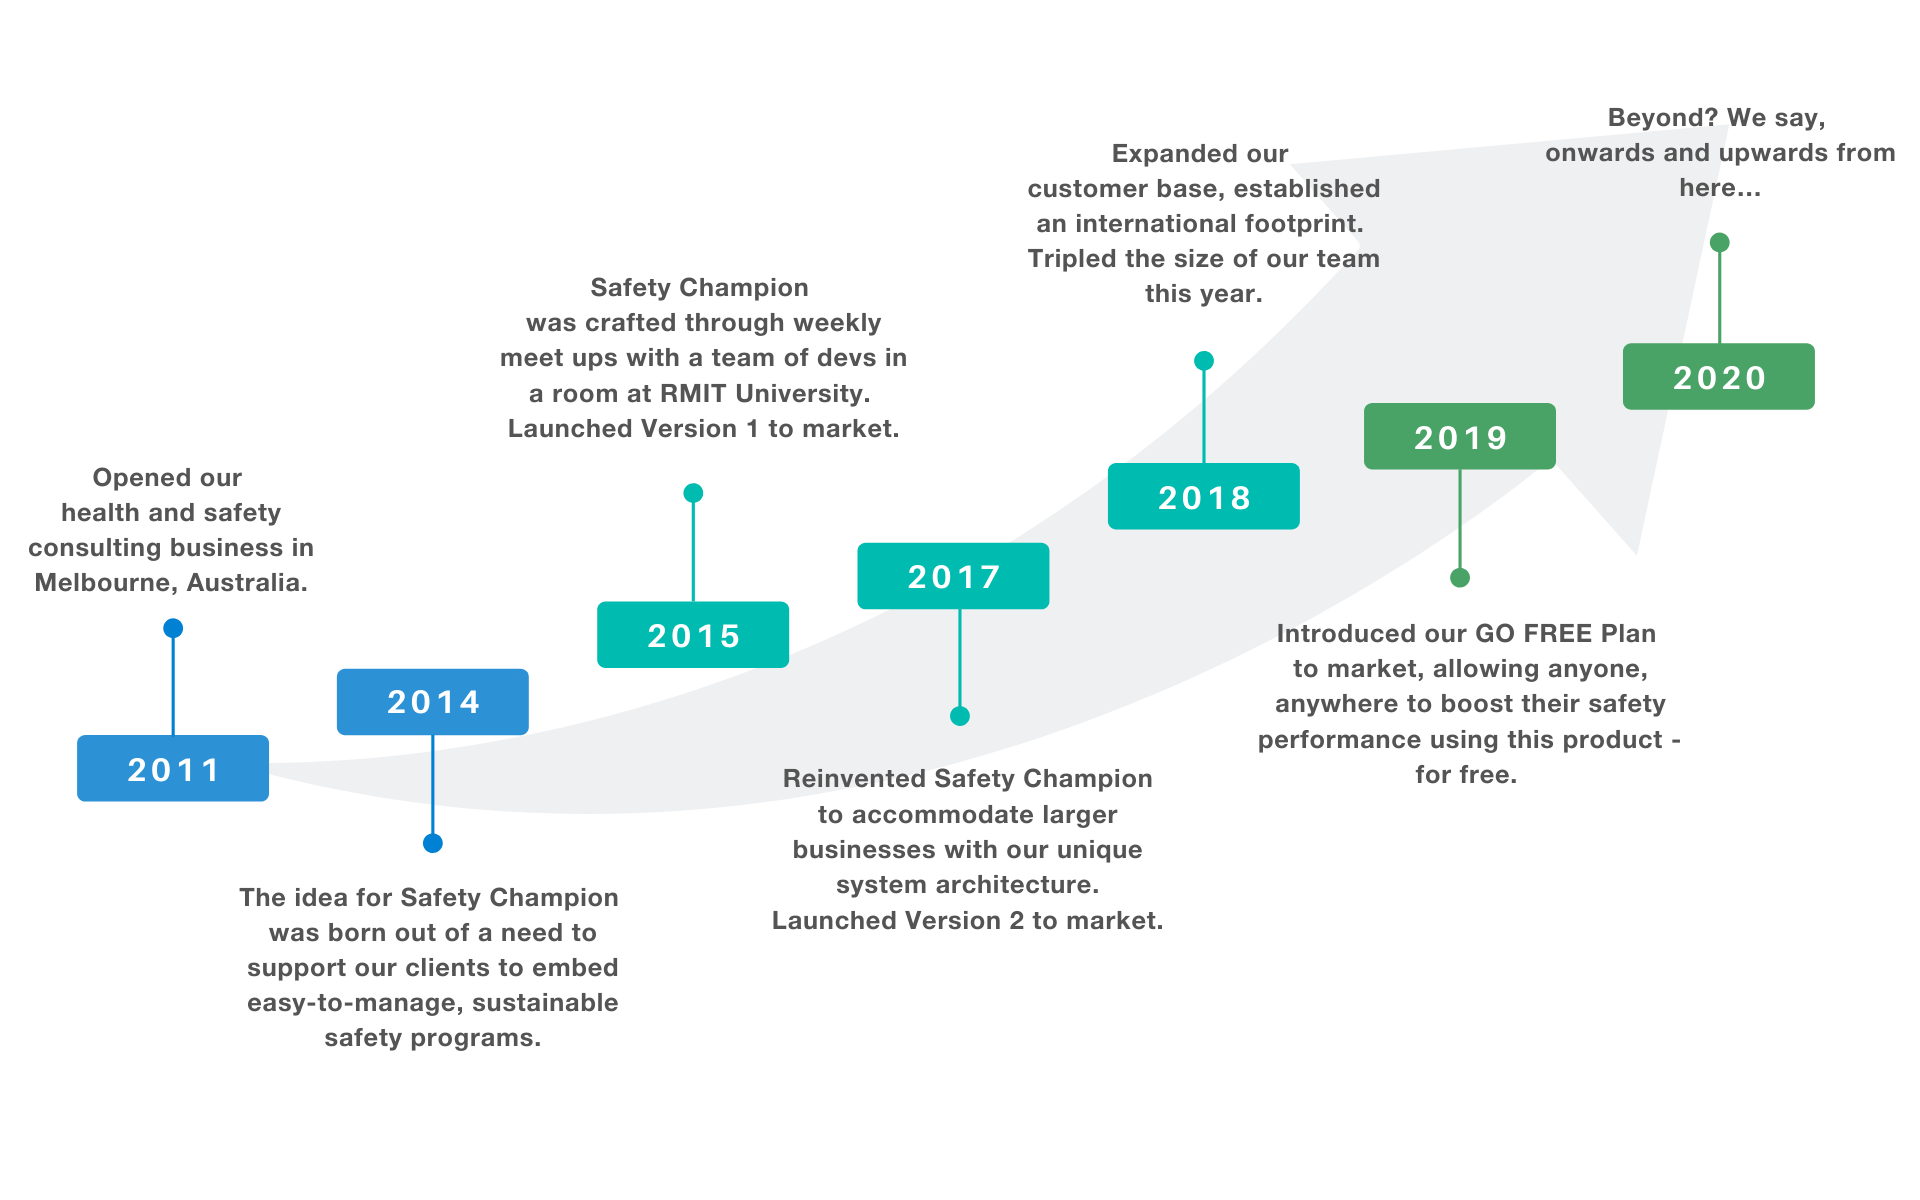 SC Timeline-Our Journey